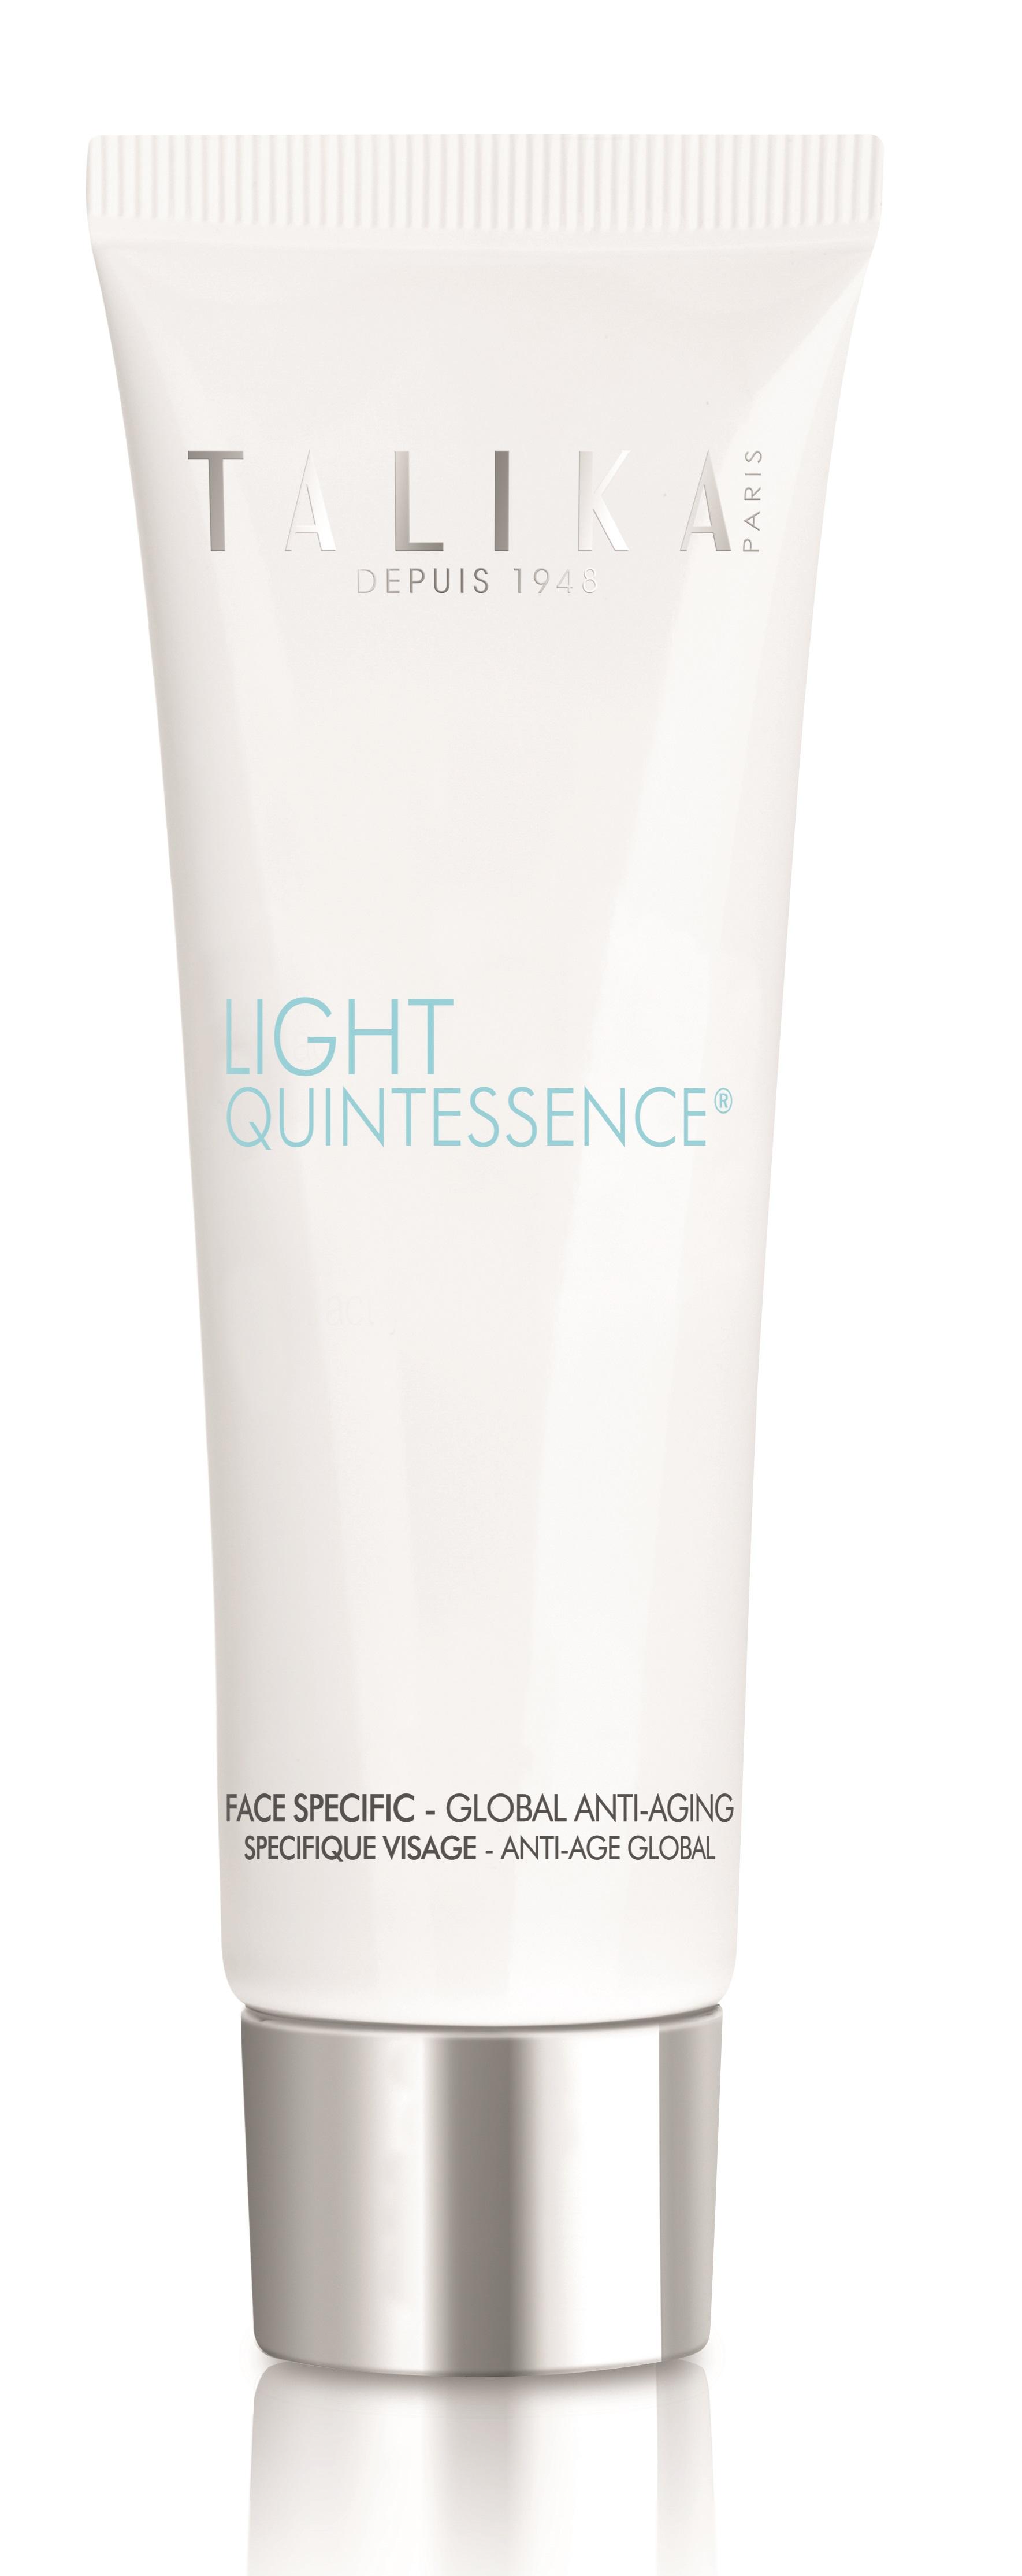 Talika_Light Quintessence Day Cream 30 ml